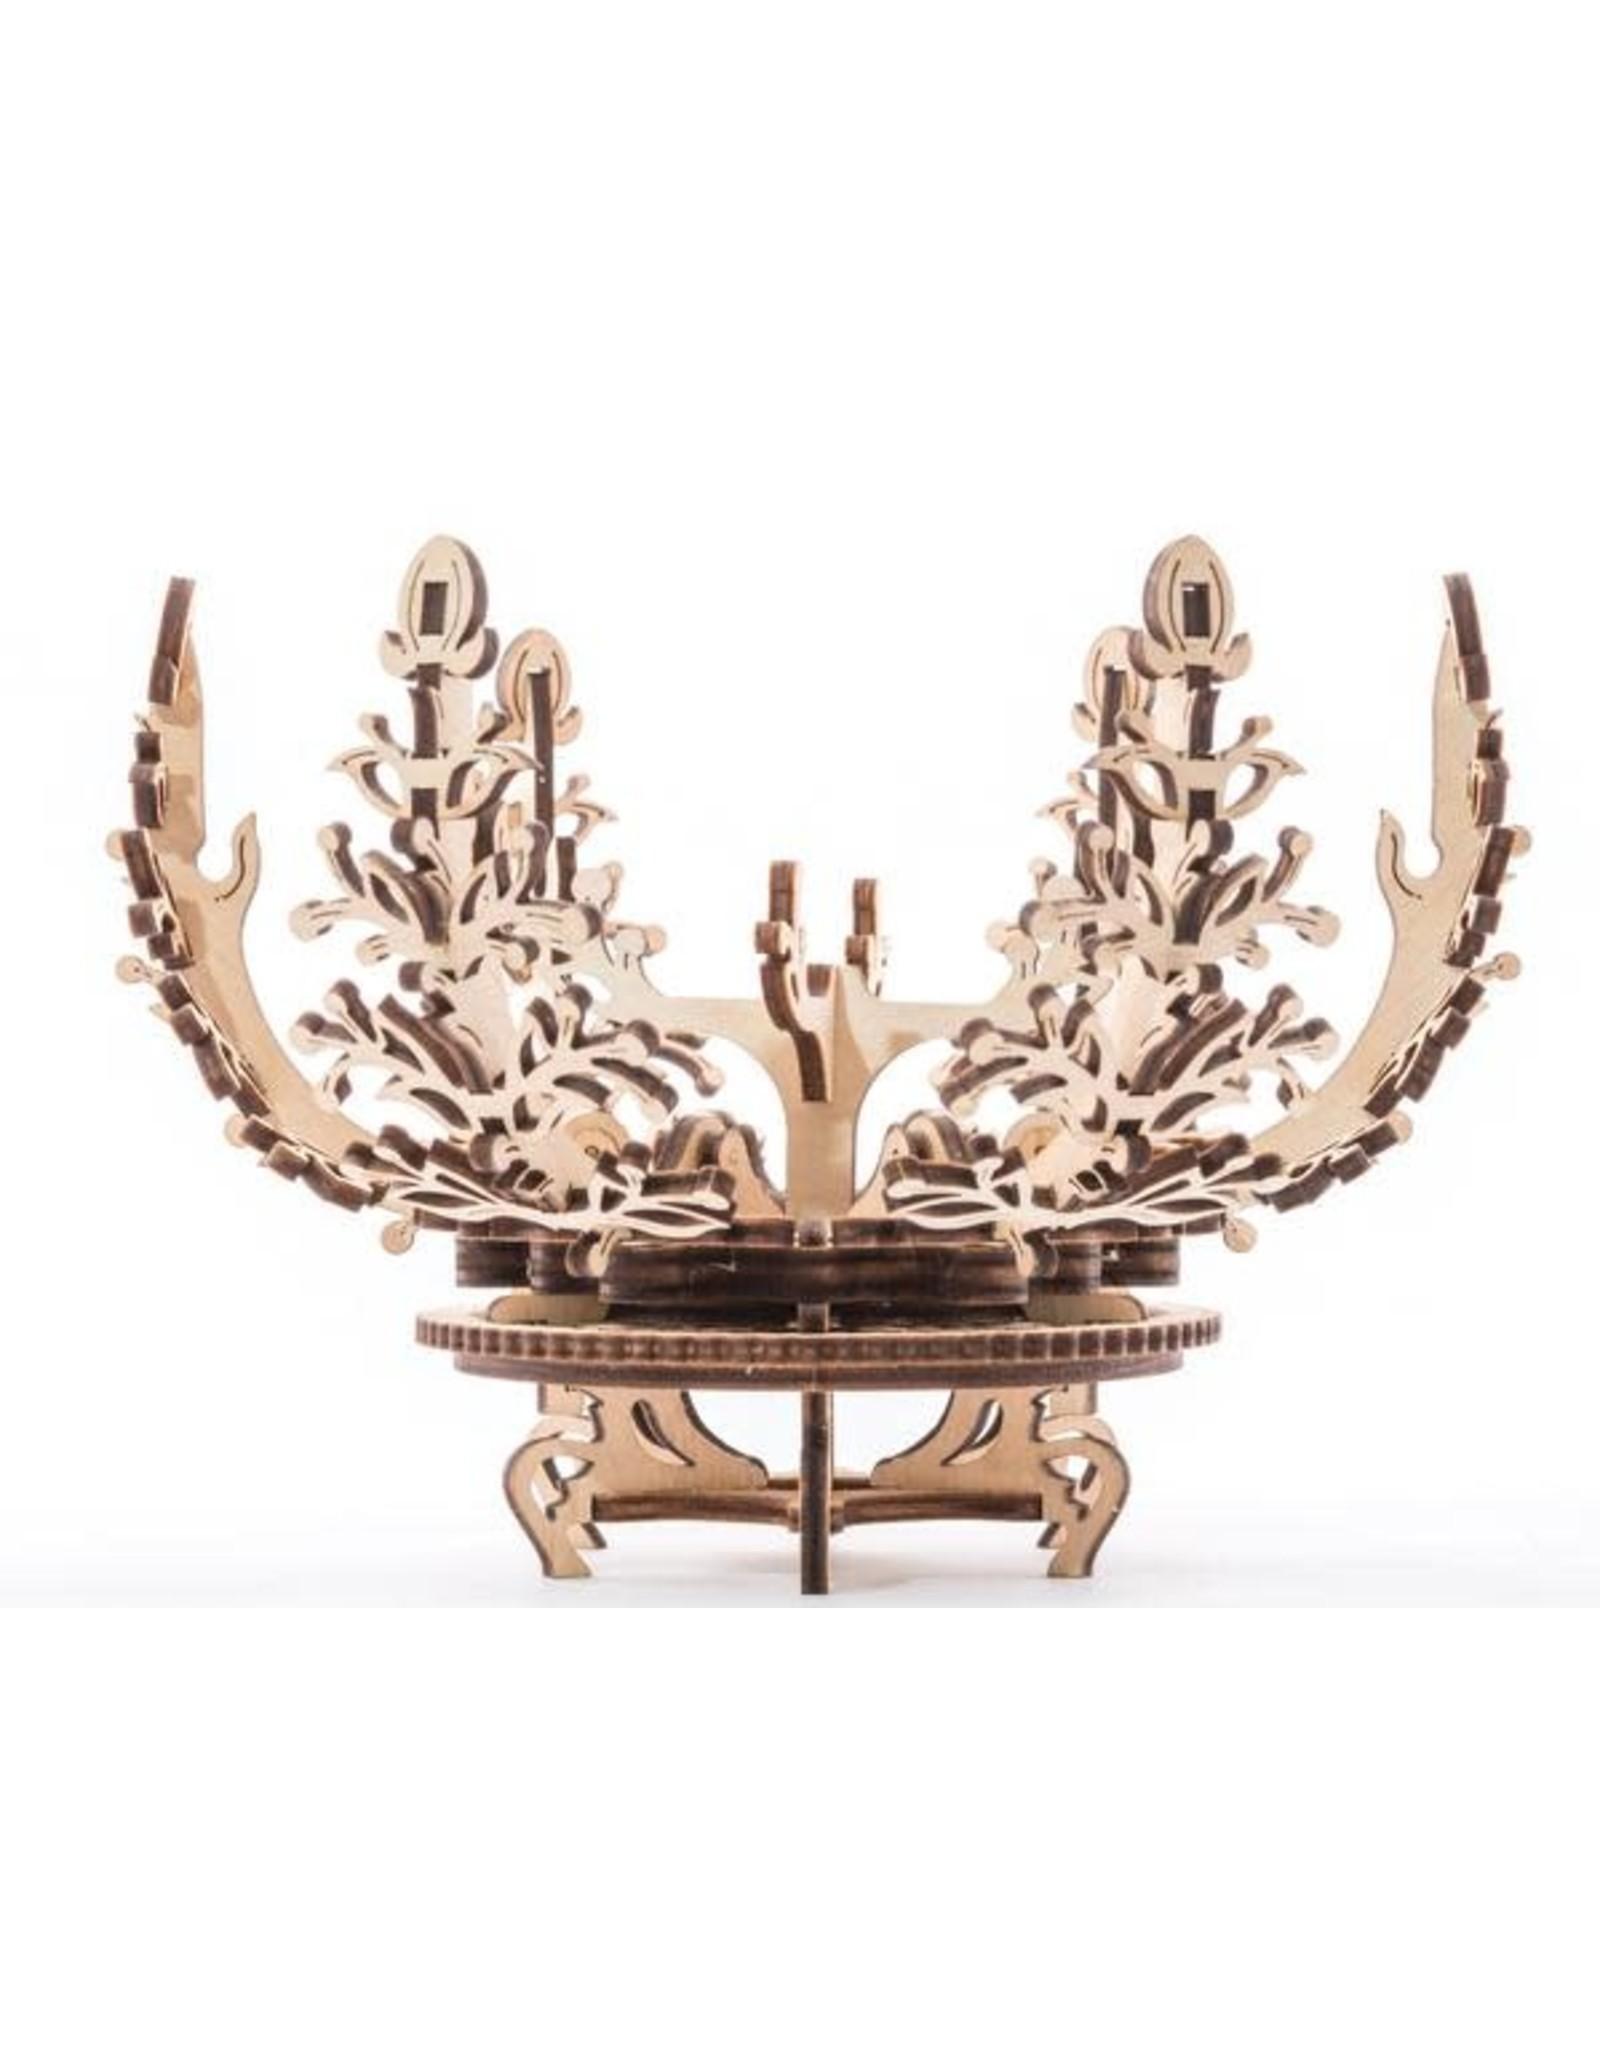 UGears Mechanical Flower Wood Model